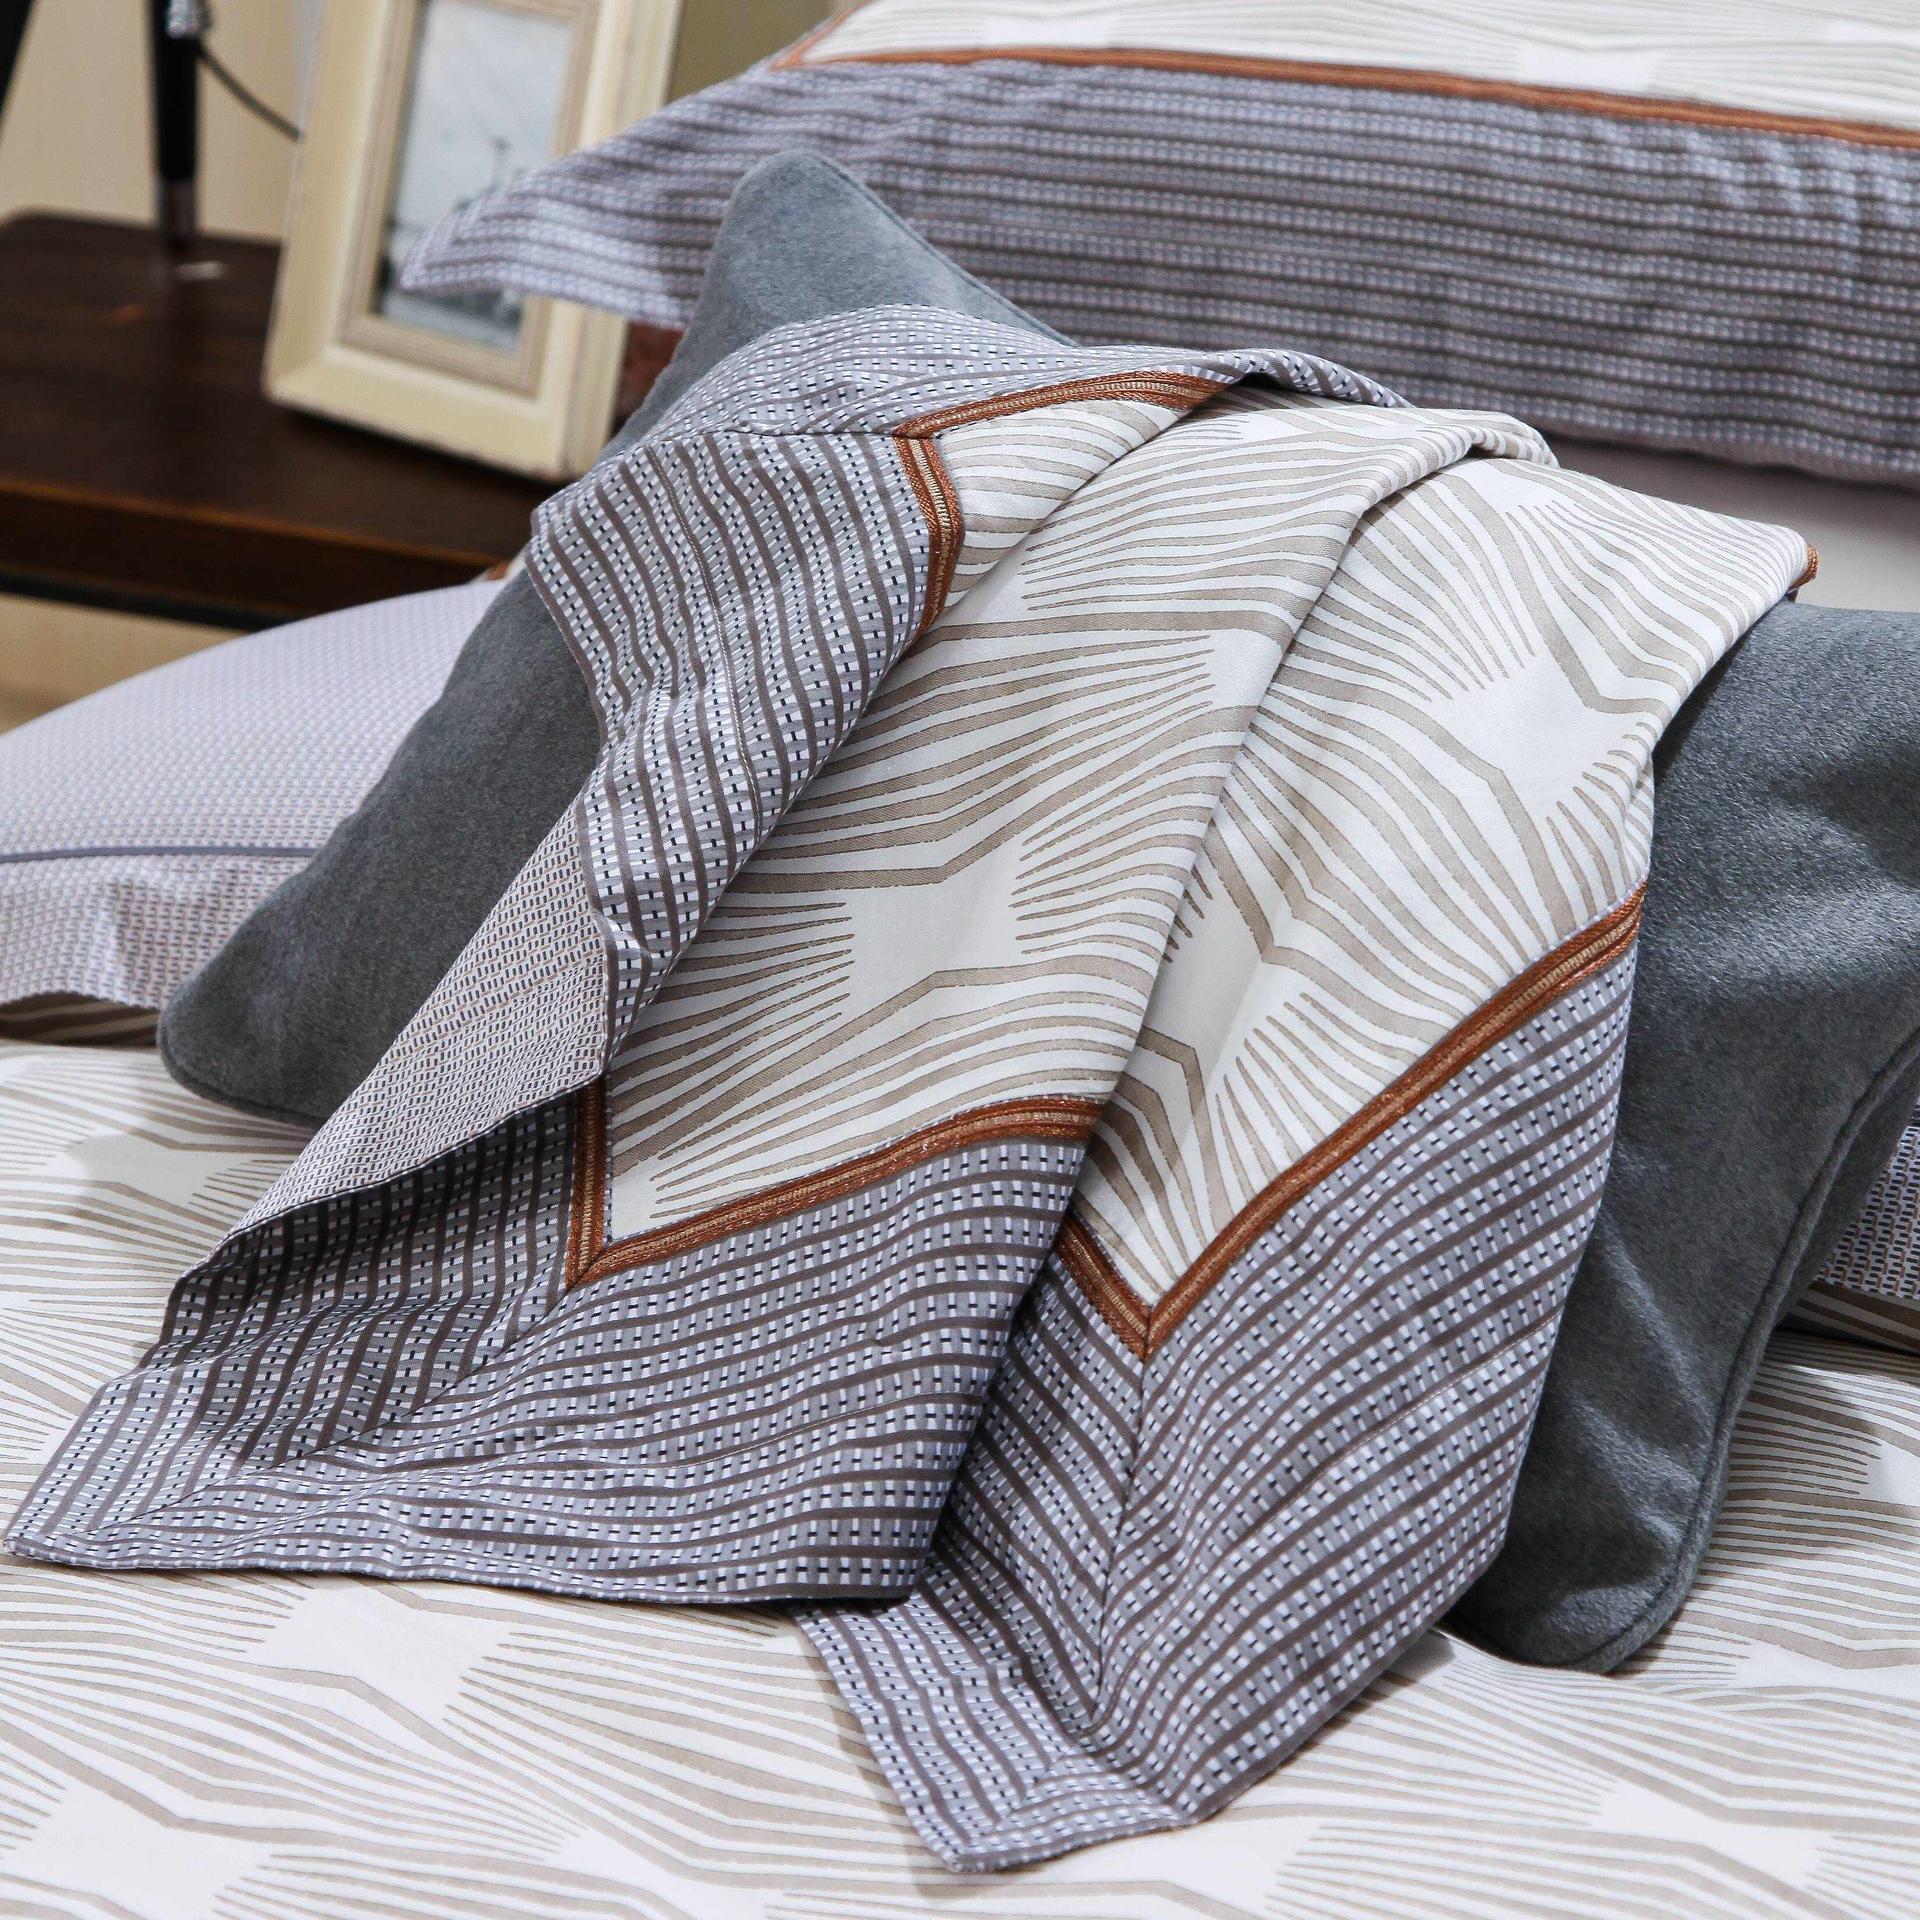 Daphne Stylish Cotton Bedding Set 6879